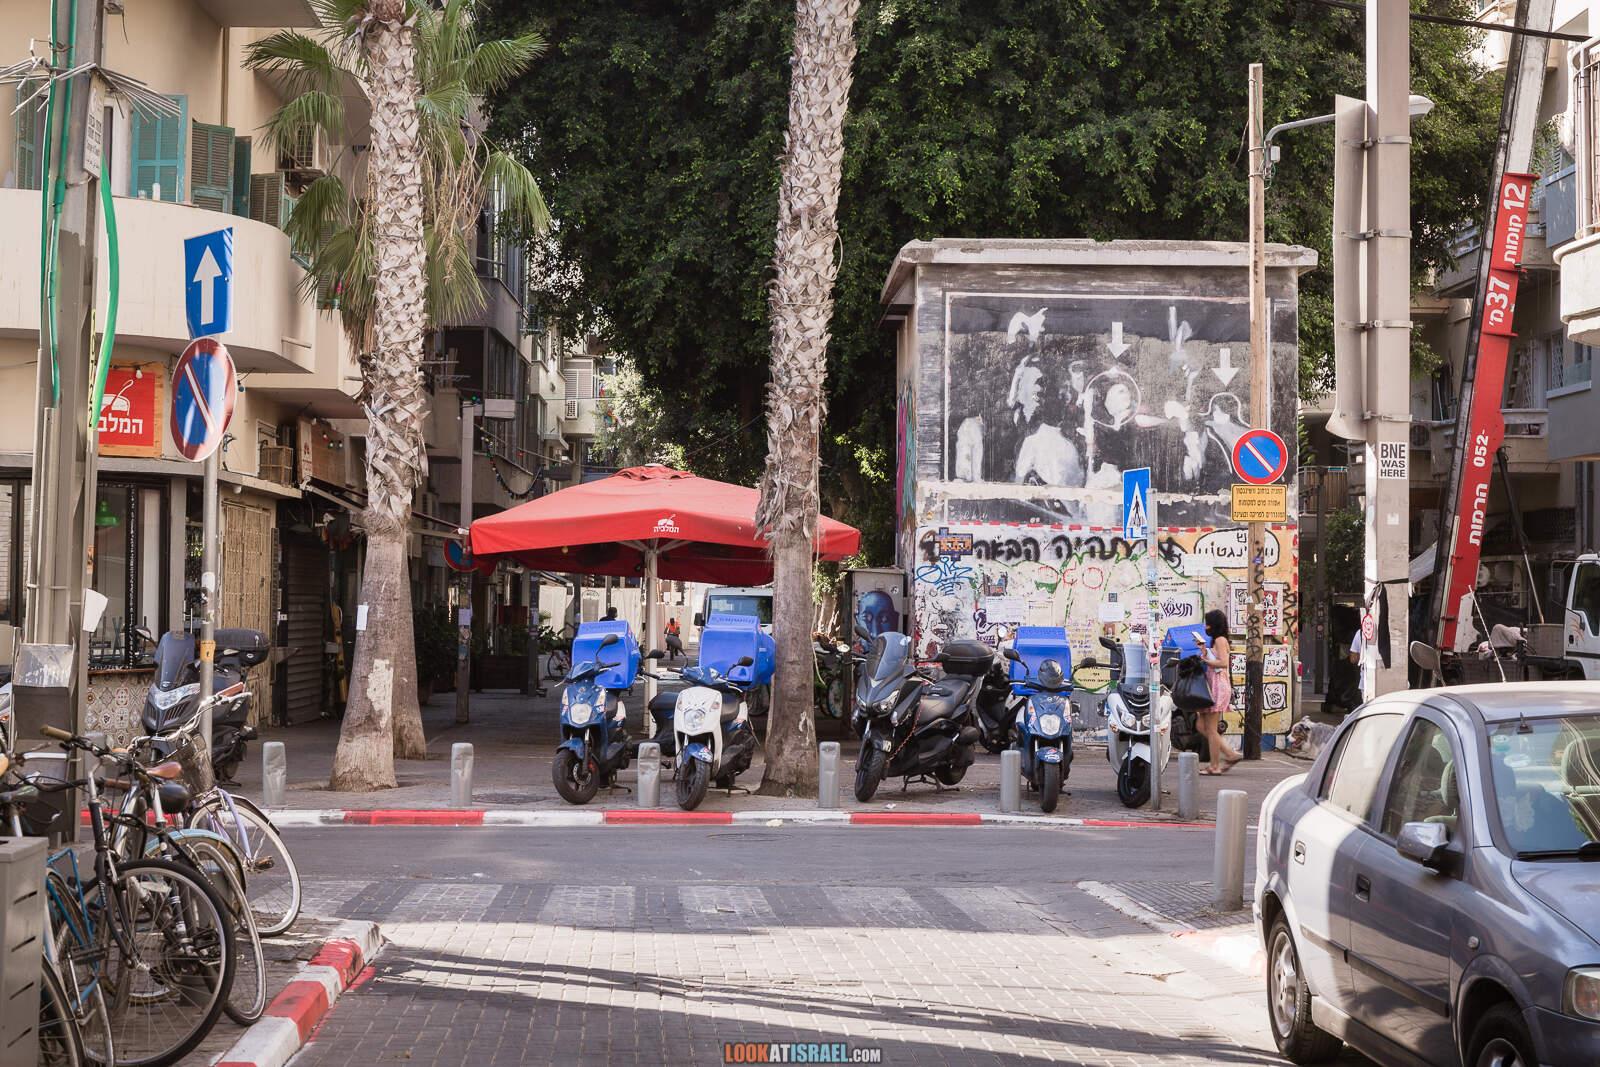 Тель-Авив, квартал Флорентин во время карантина | Lockdown in Florentin of Tel Aviv | LookAtIsrael.com - Фото путешествия по Израилю